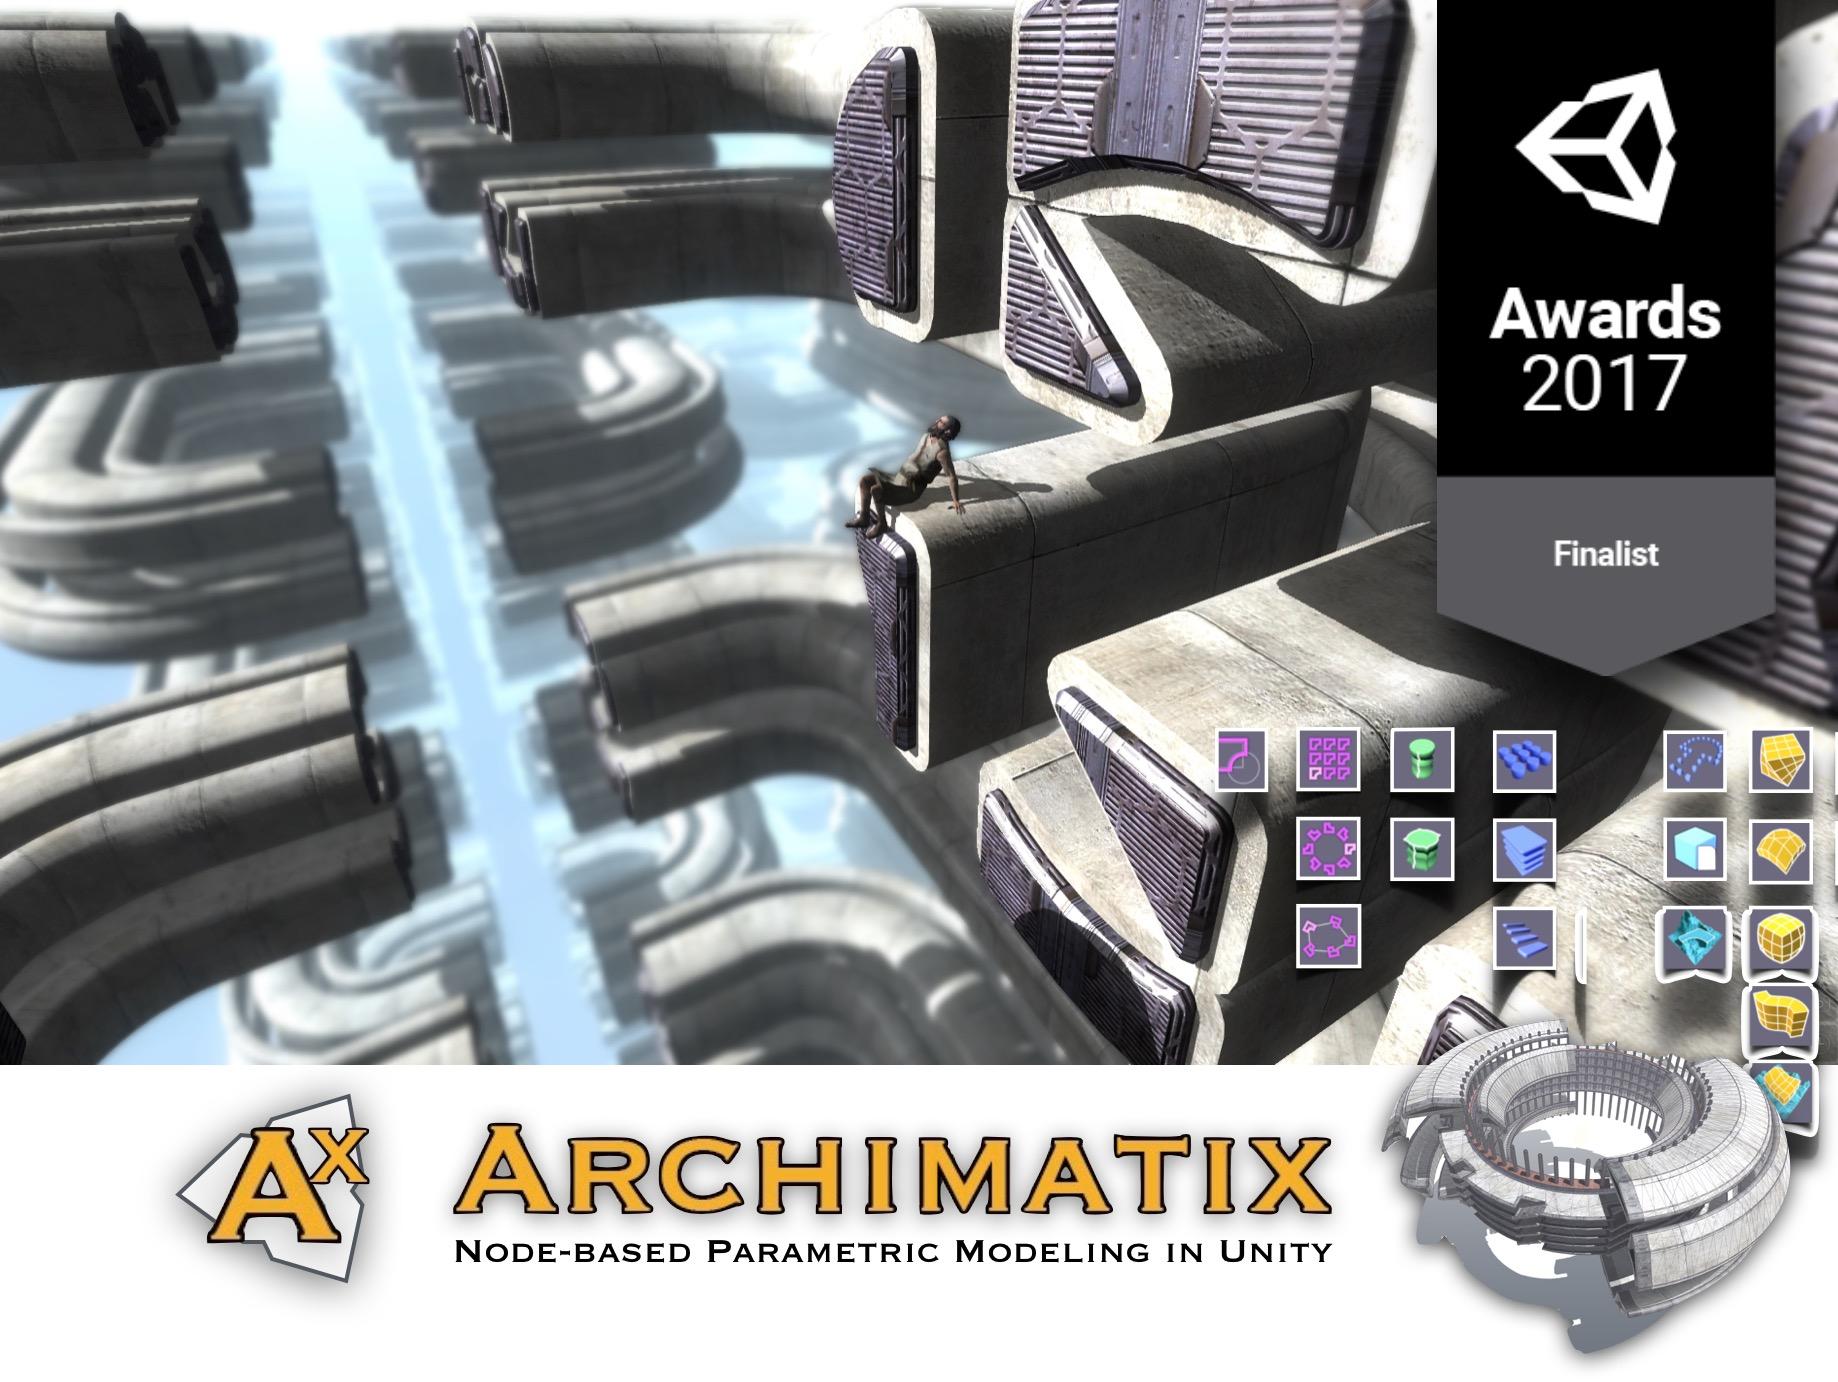 Archimatix 2017-09-13_04-44-33_PM.jpg